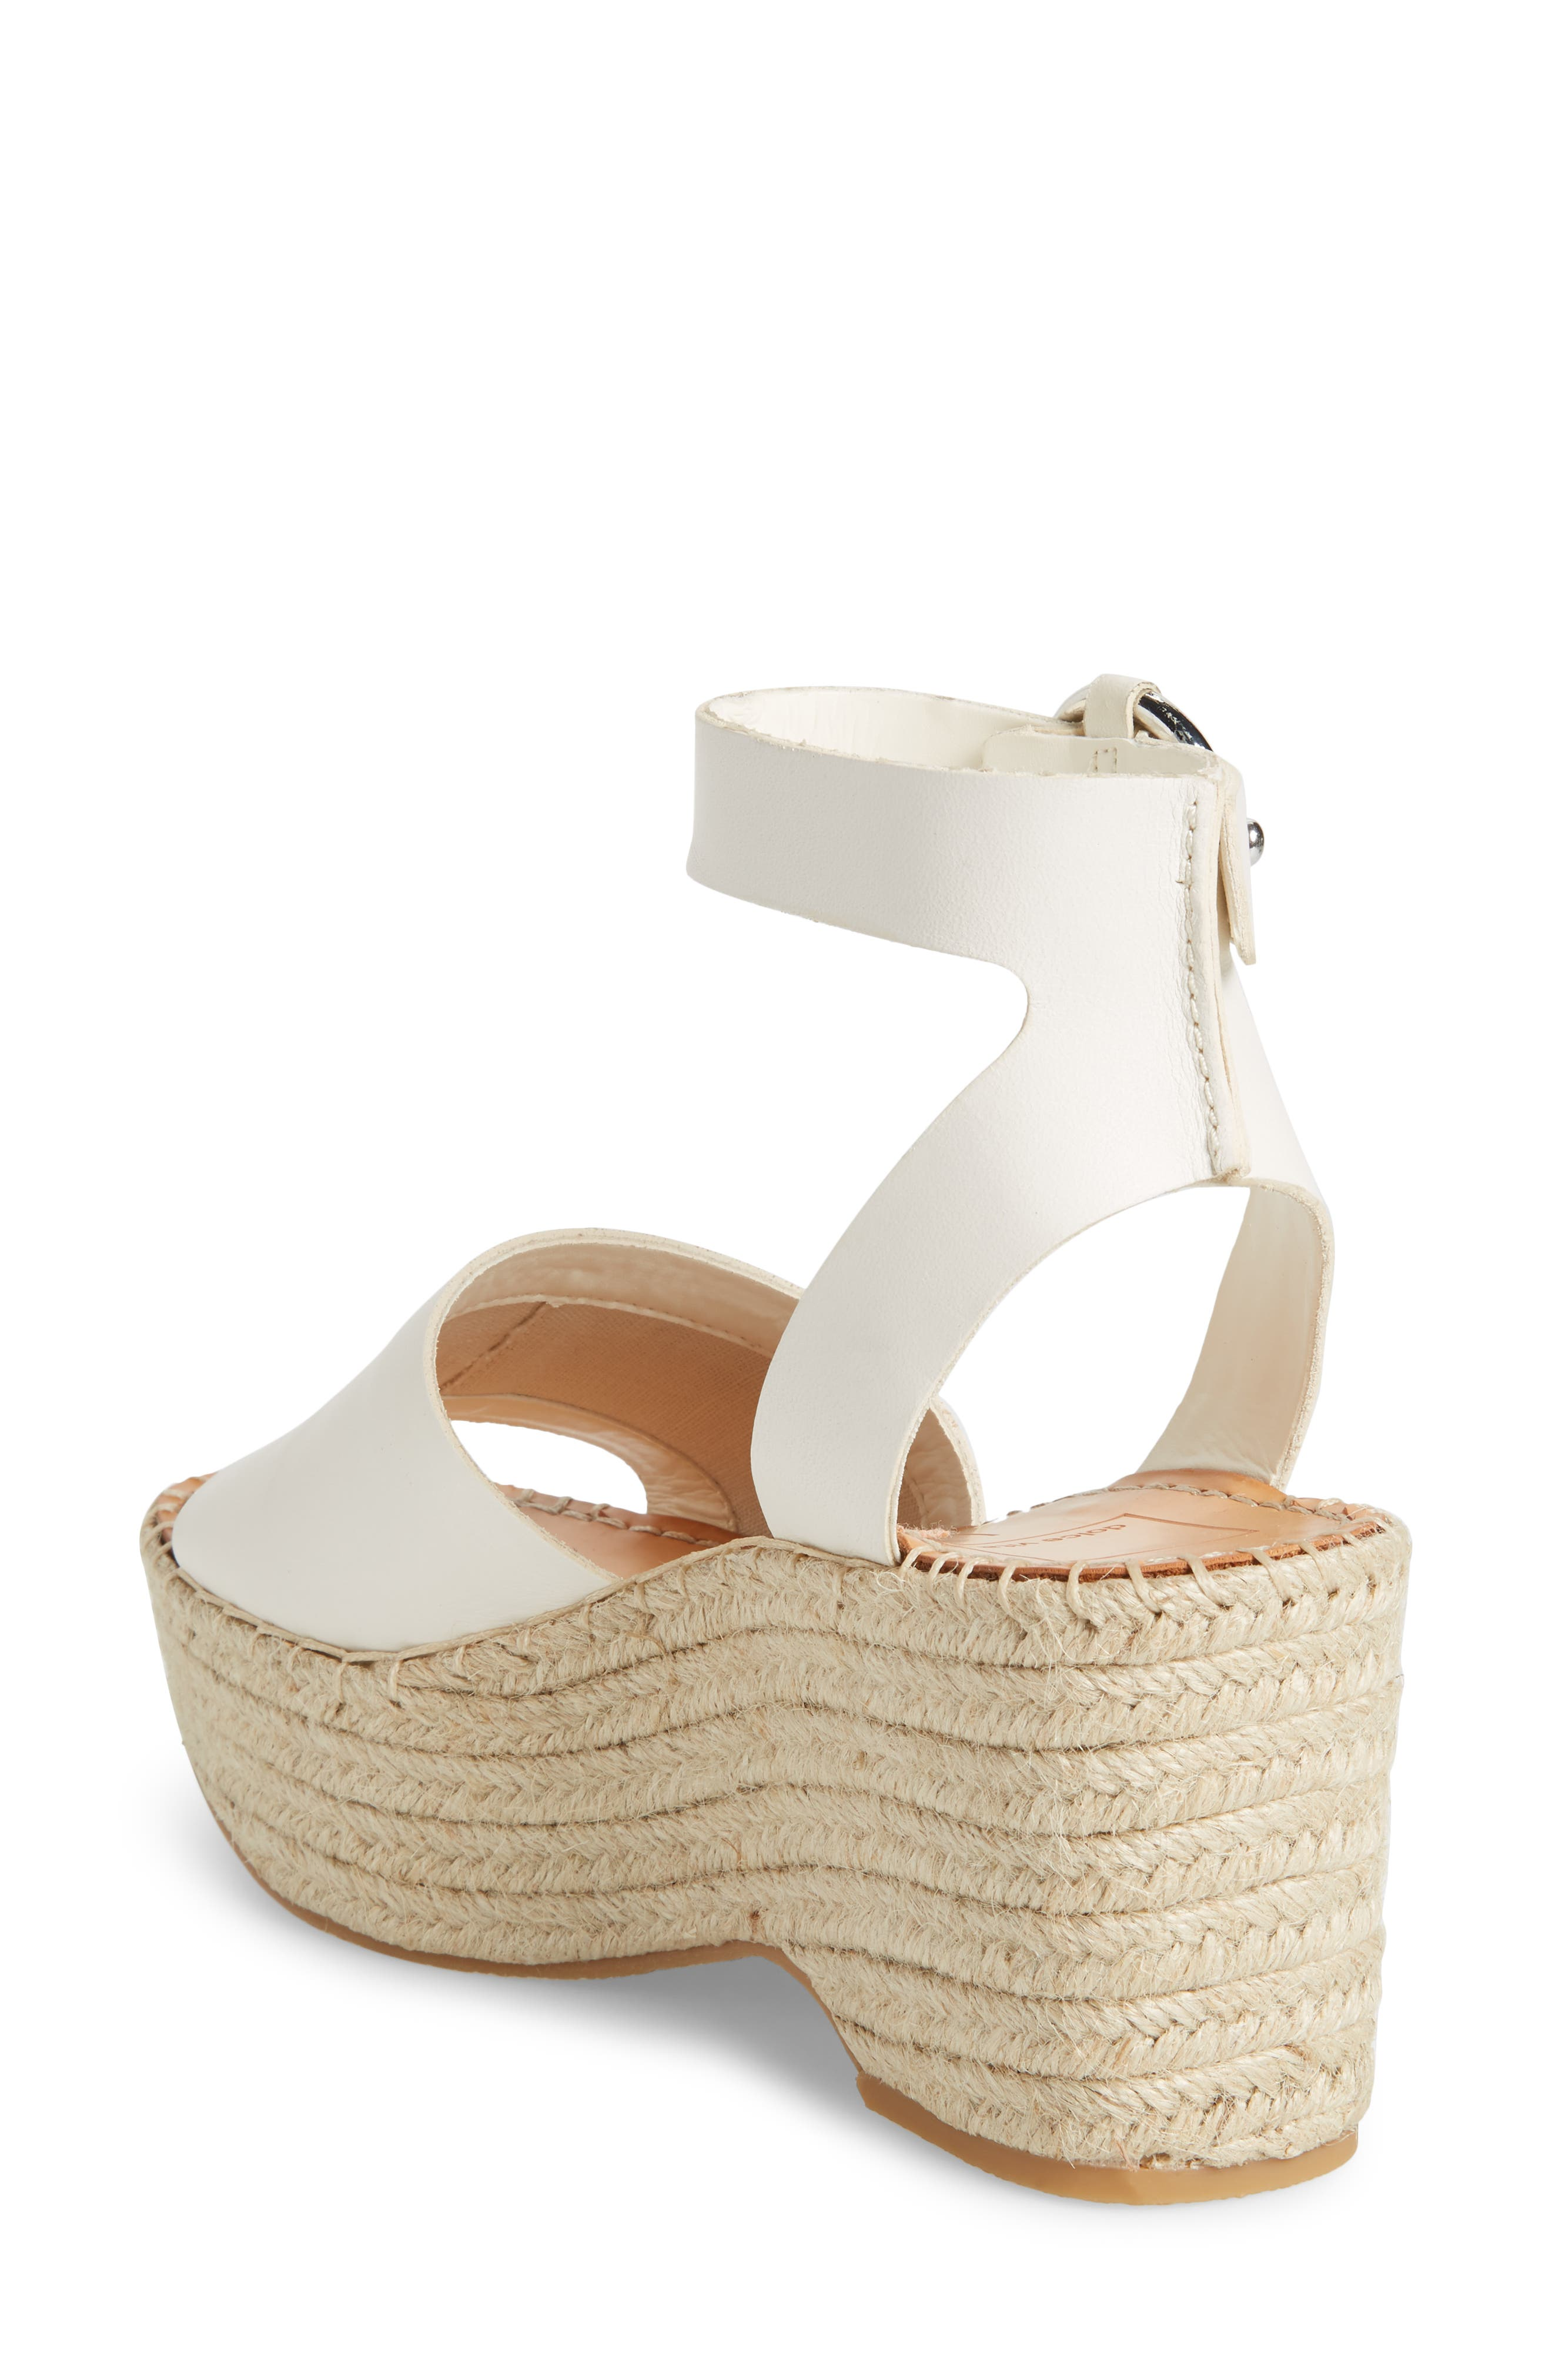 Lesly Espadrille Platform Sandal,                             Alternate thumbnail 2, color,                             Off White